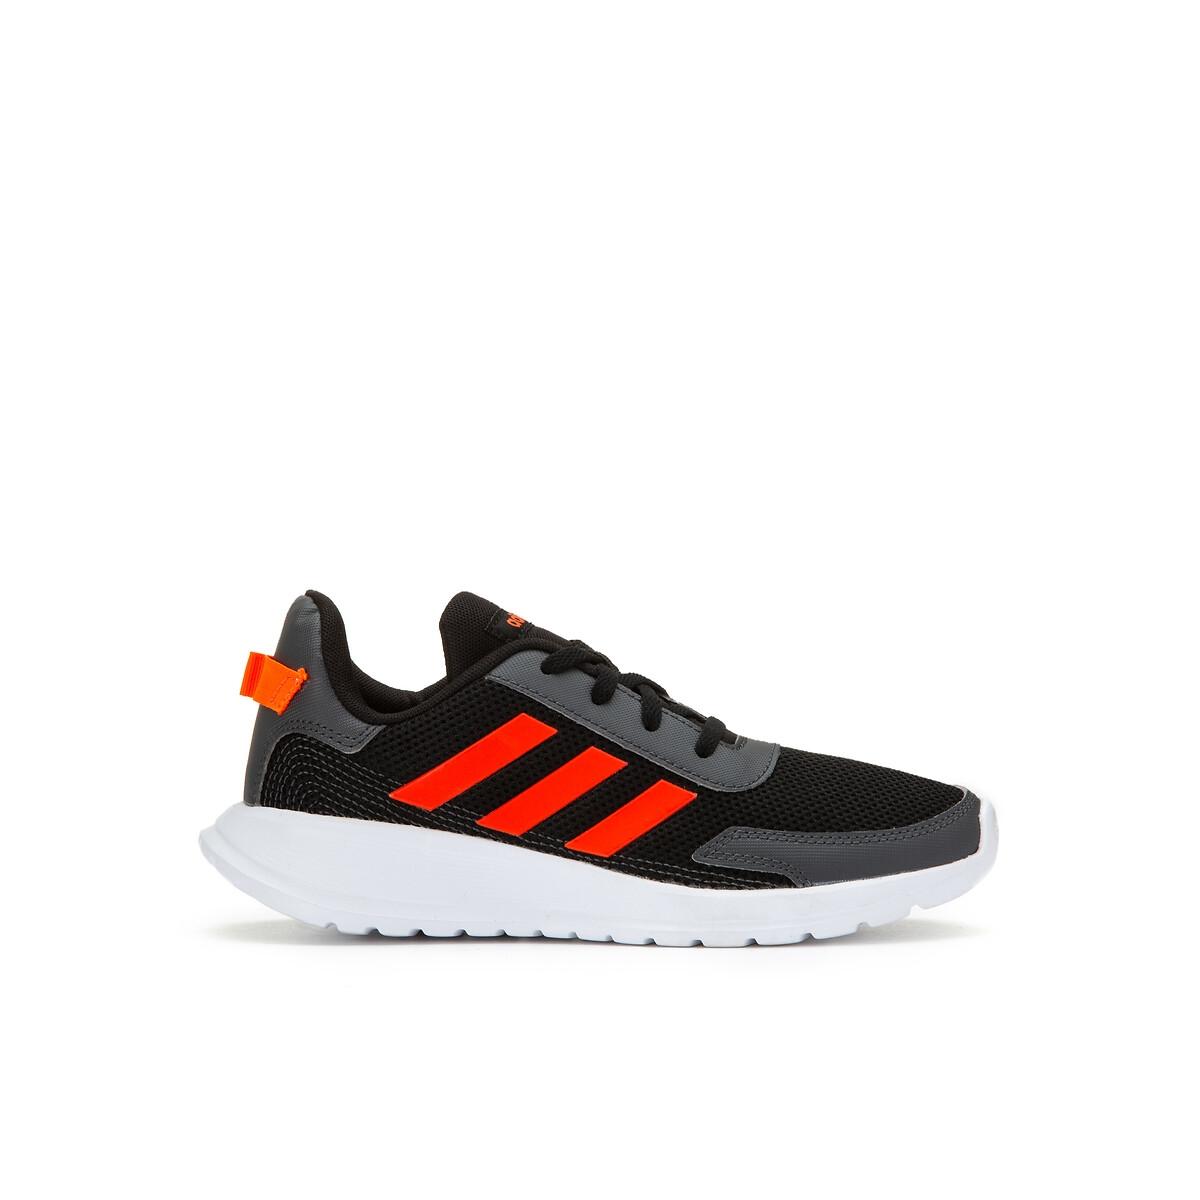 Adidas Performance Tensaur Run K hardloopschoenen zwart/rood kids online kopen